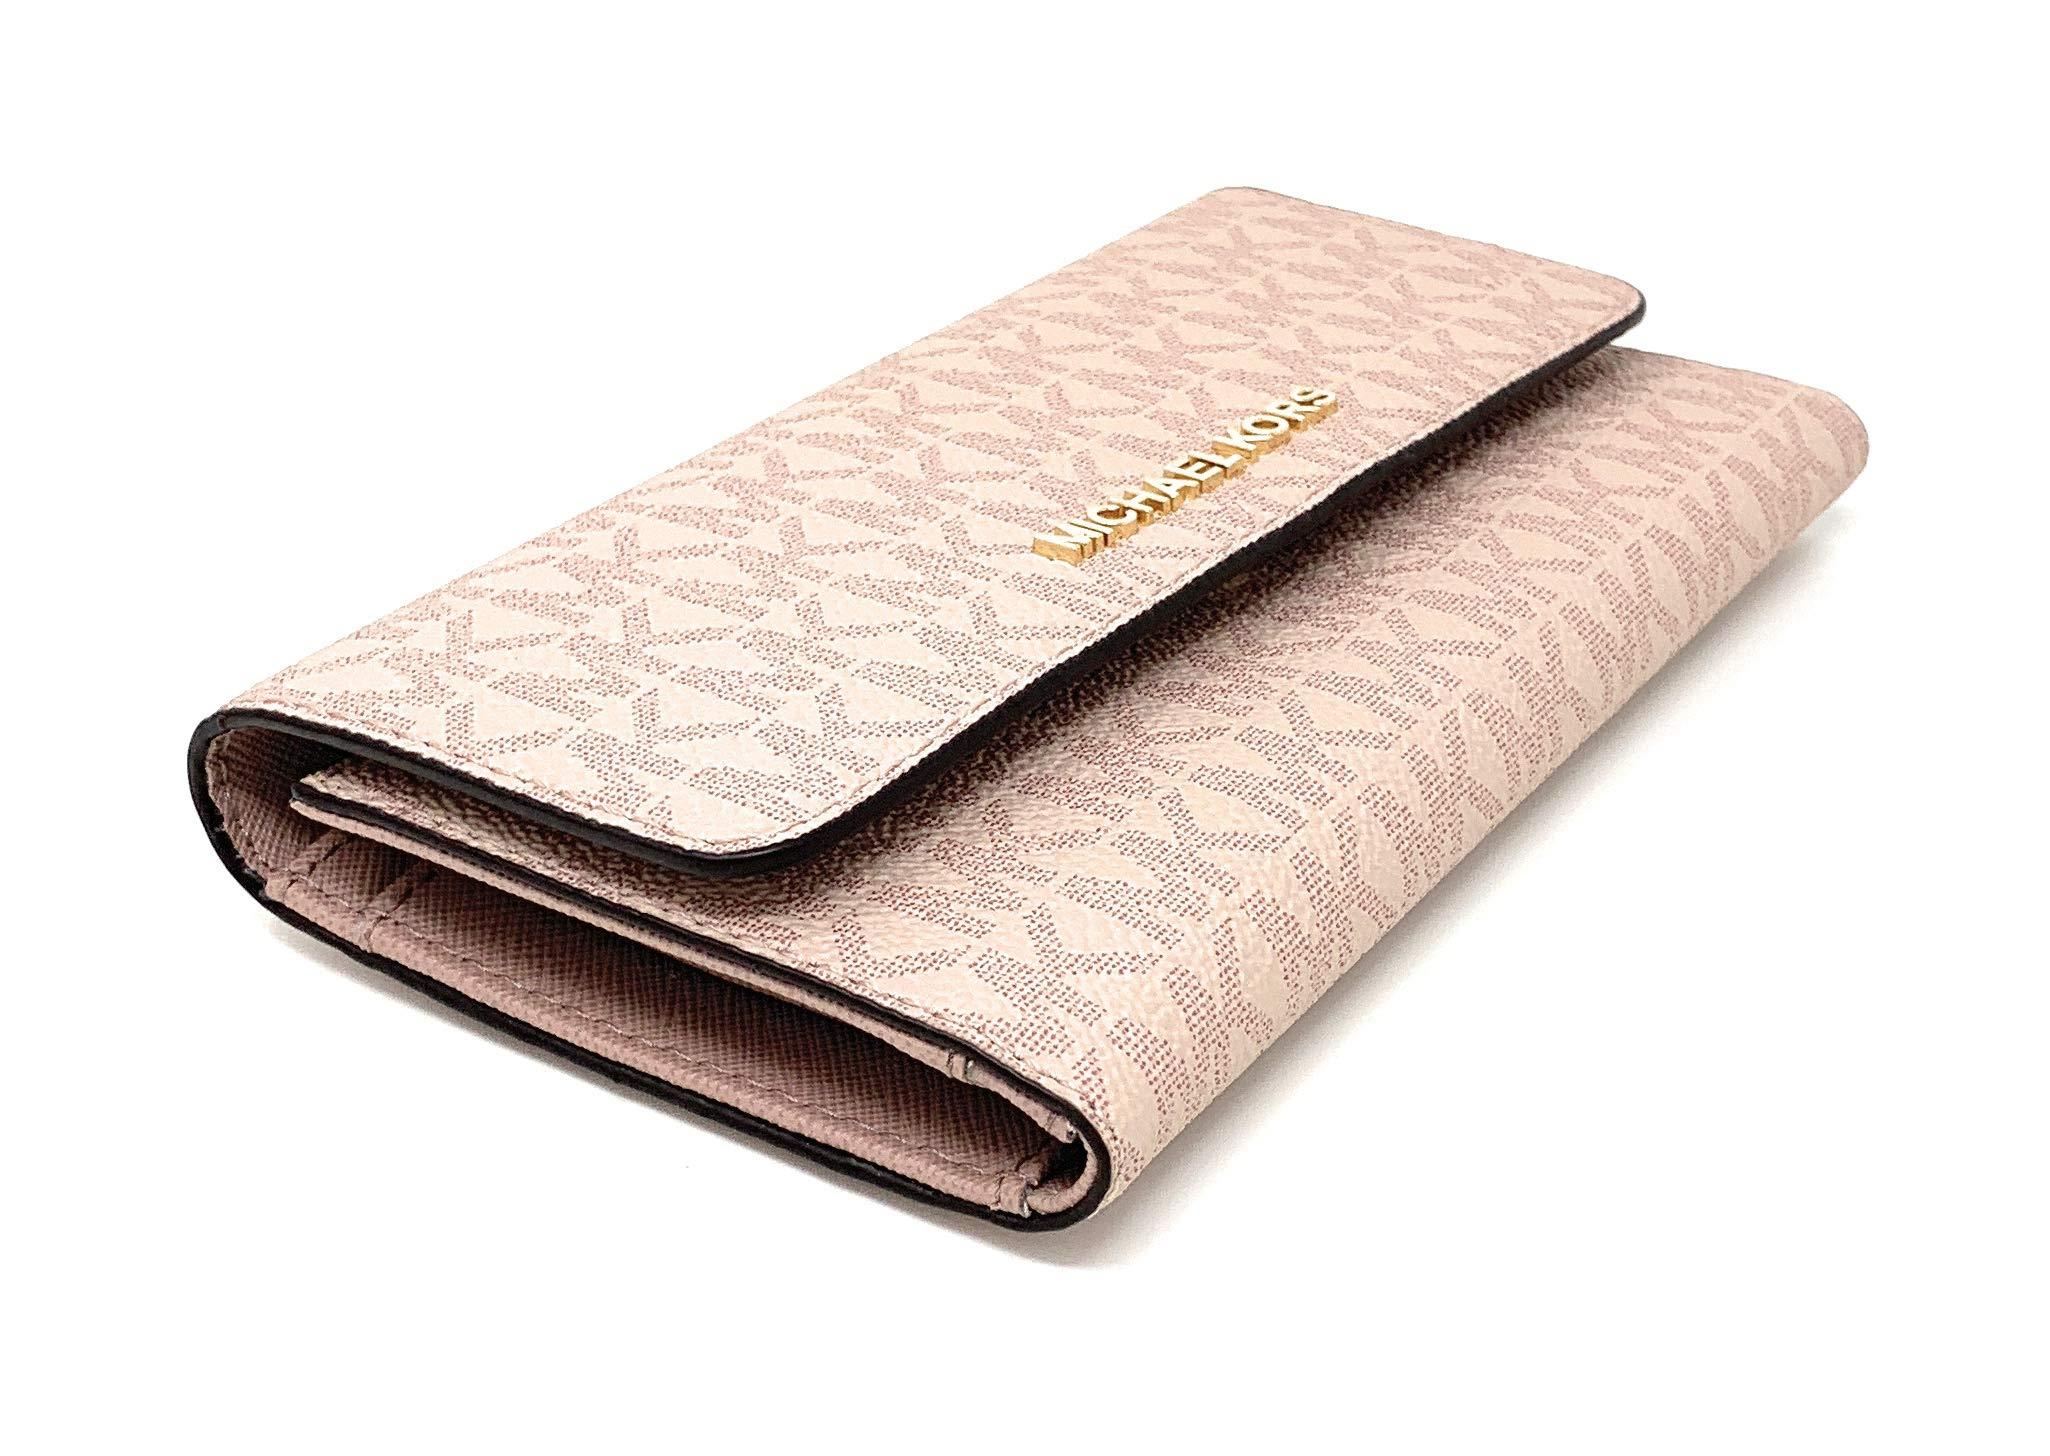 Michael Kors Jet Set Travel Large Trifold Signature PVC Wallet (Fawn/Ballet) by Michael Kors (Image #3)